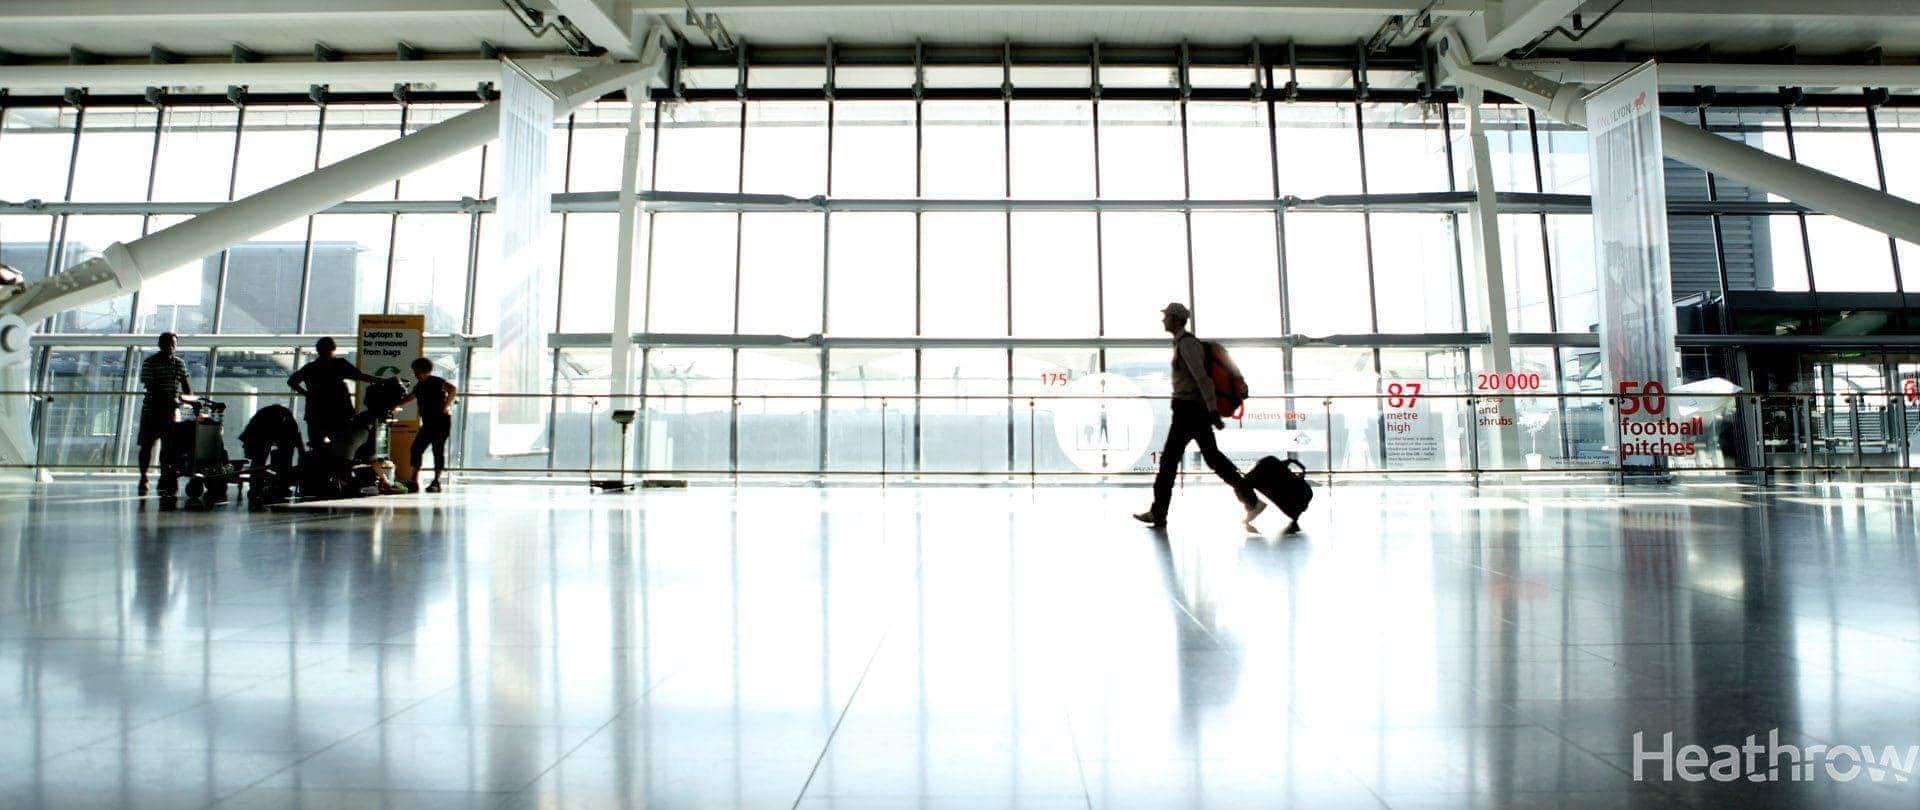 air-pic-heathrow_t5a-passenger_walking_through_departures_hall-ferrovial